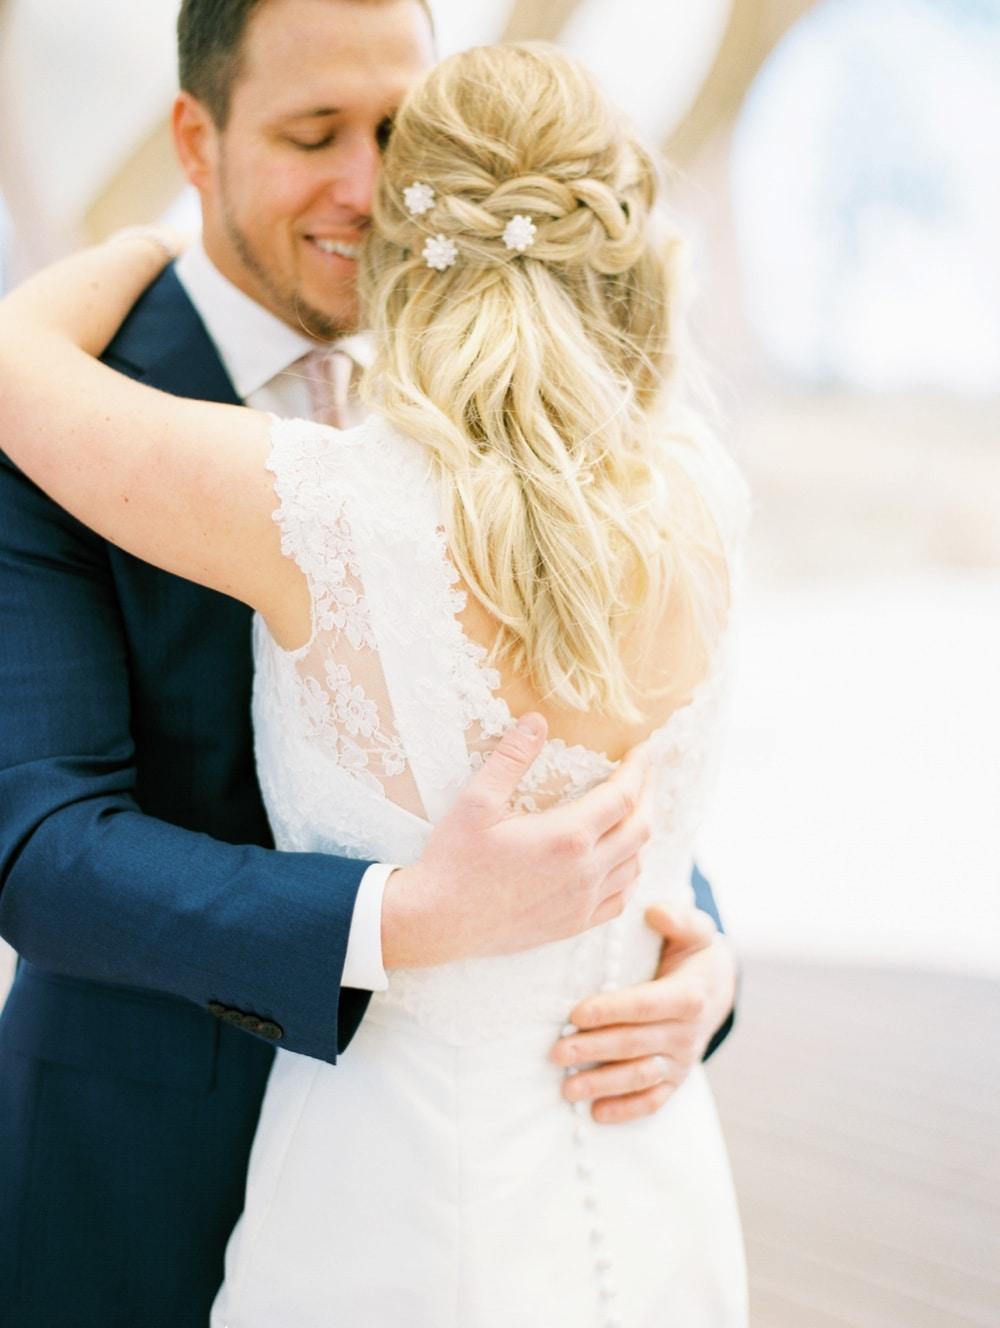 kristin-la-voie-photography-Cafe-Brauer-Chicago-Wedding-Photographer-53